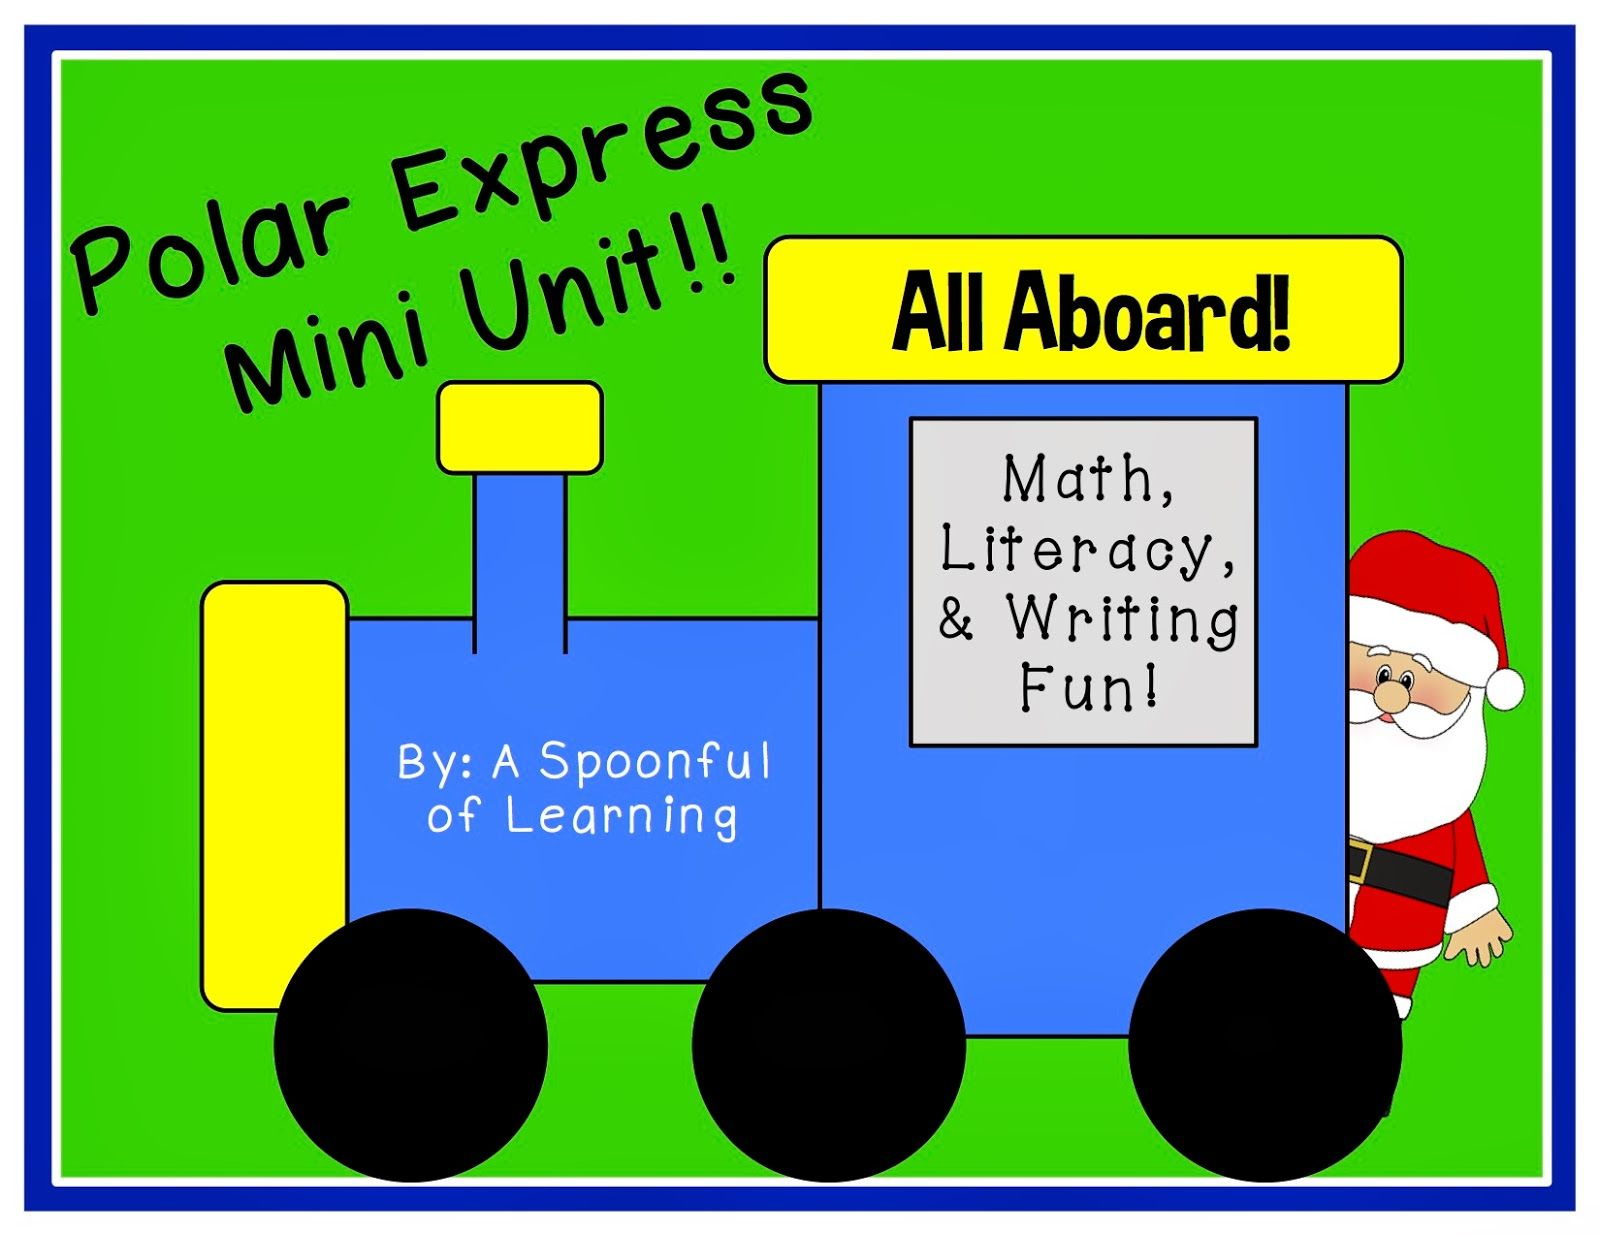 Polar Express Mini Unit Fun